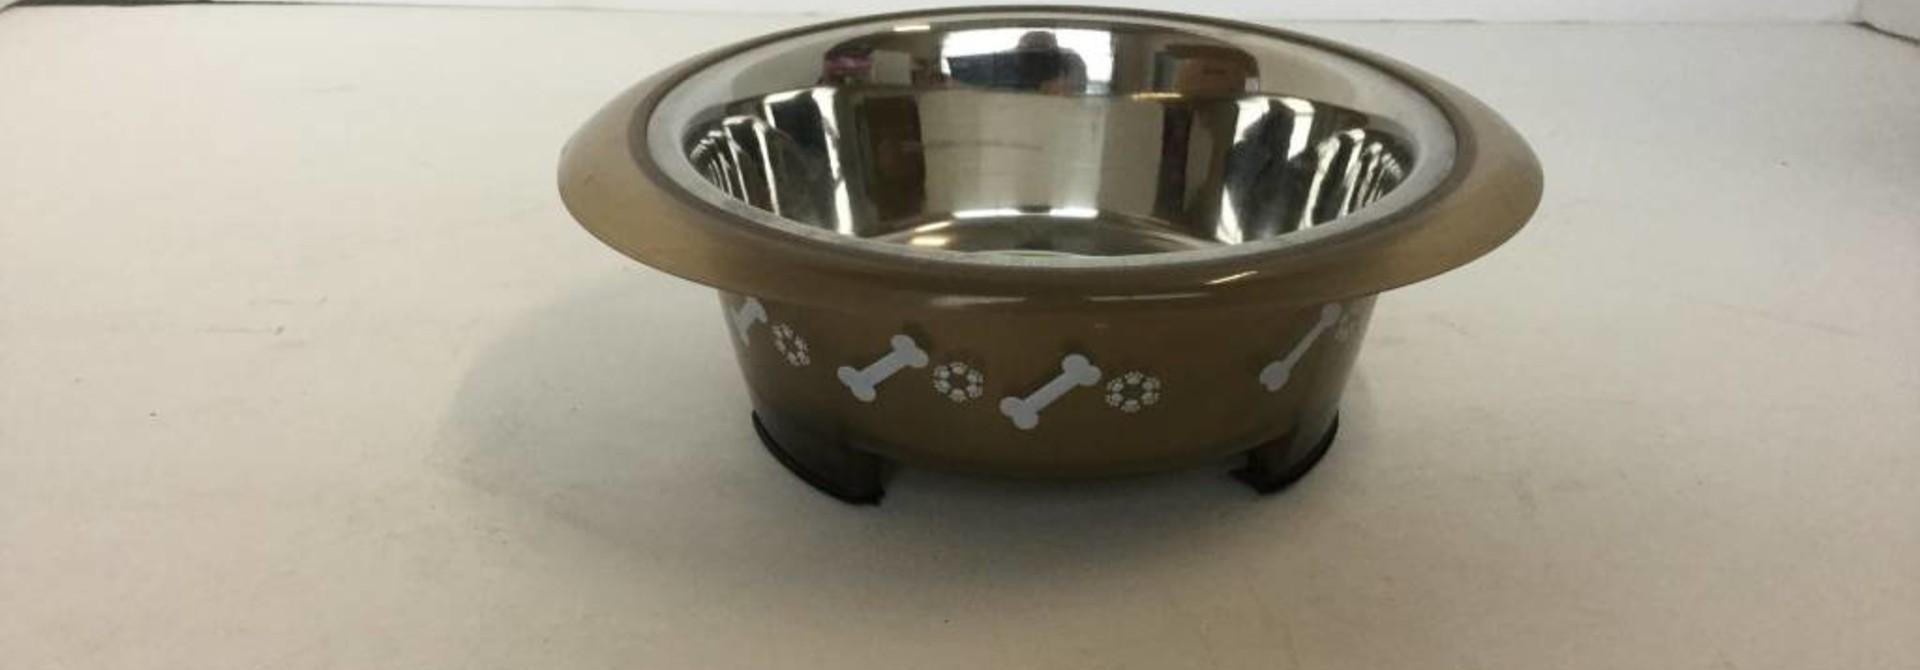 Buddy's Line Brown Small Dog Bowl 473mL